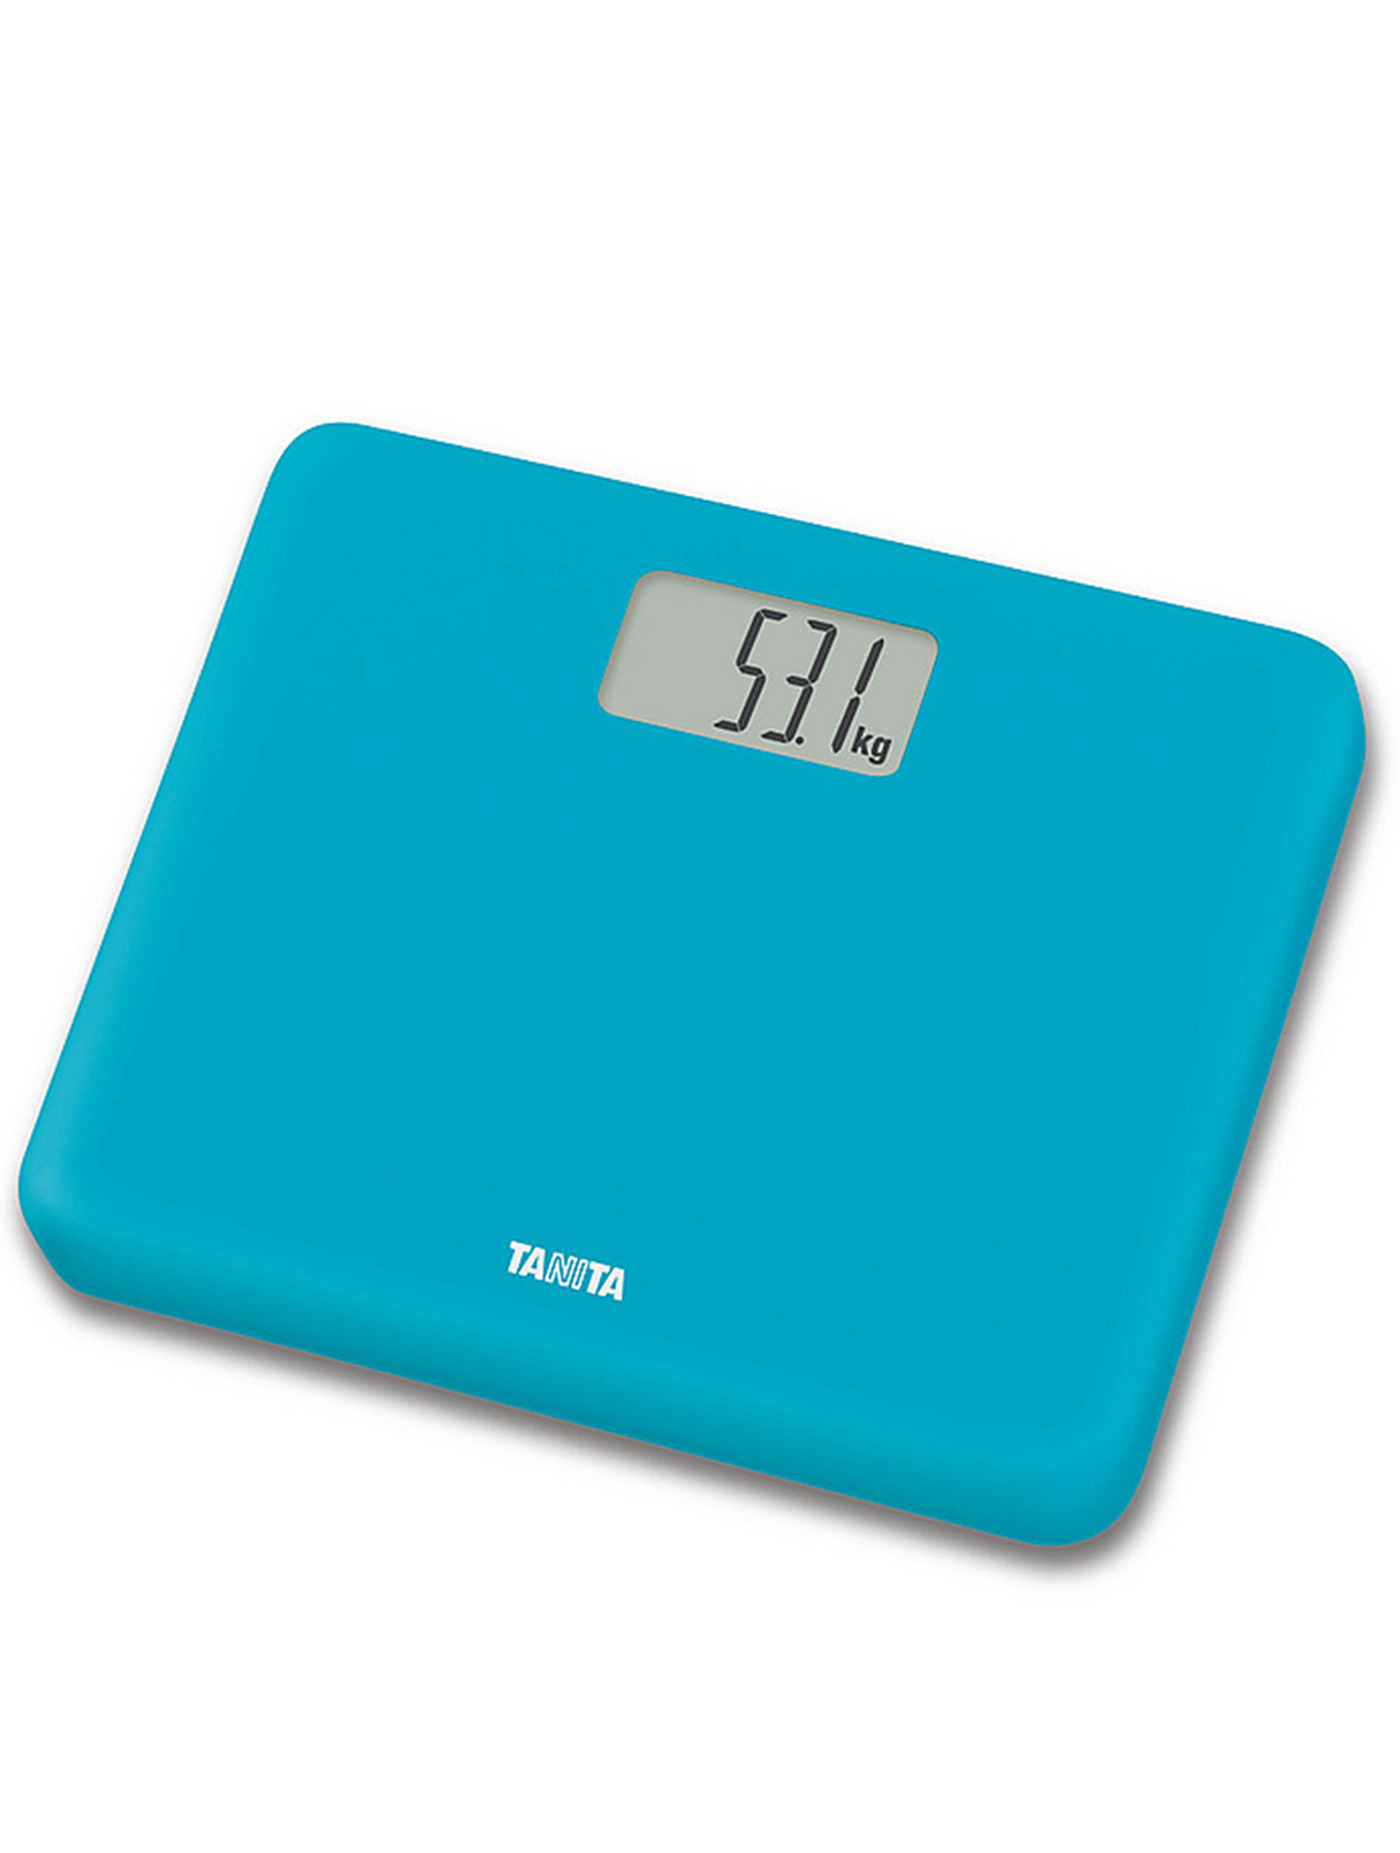 Бытовые электронные весы Tanita HD-660 - бытовые электронные весы (Blue)